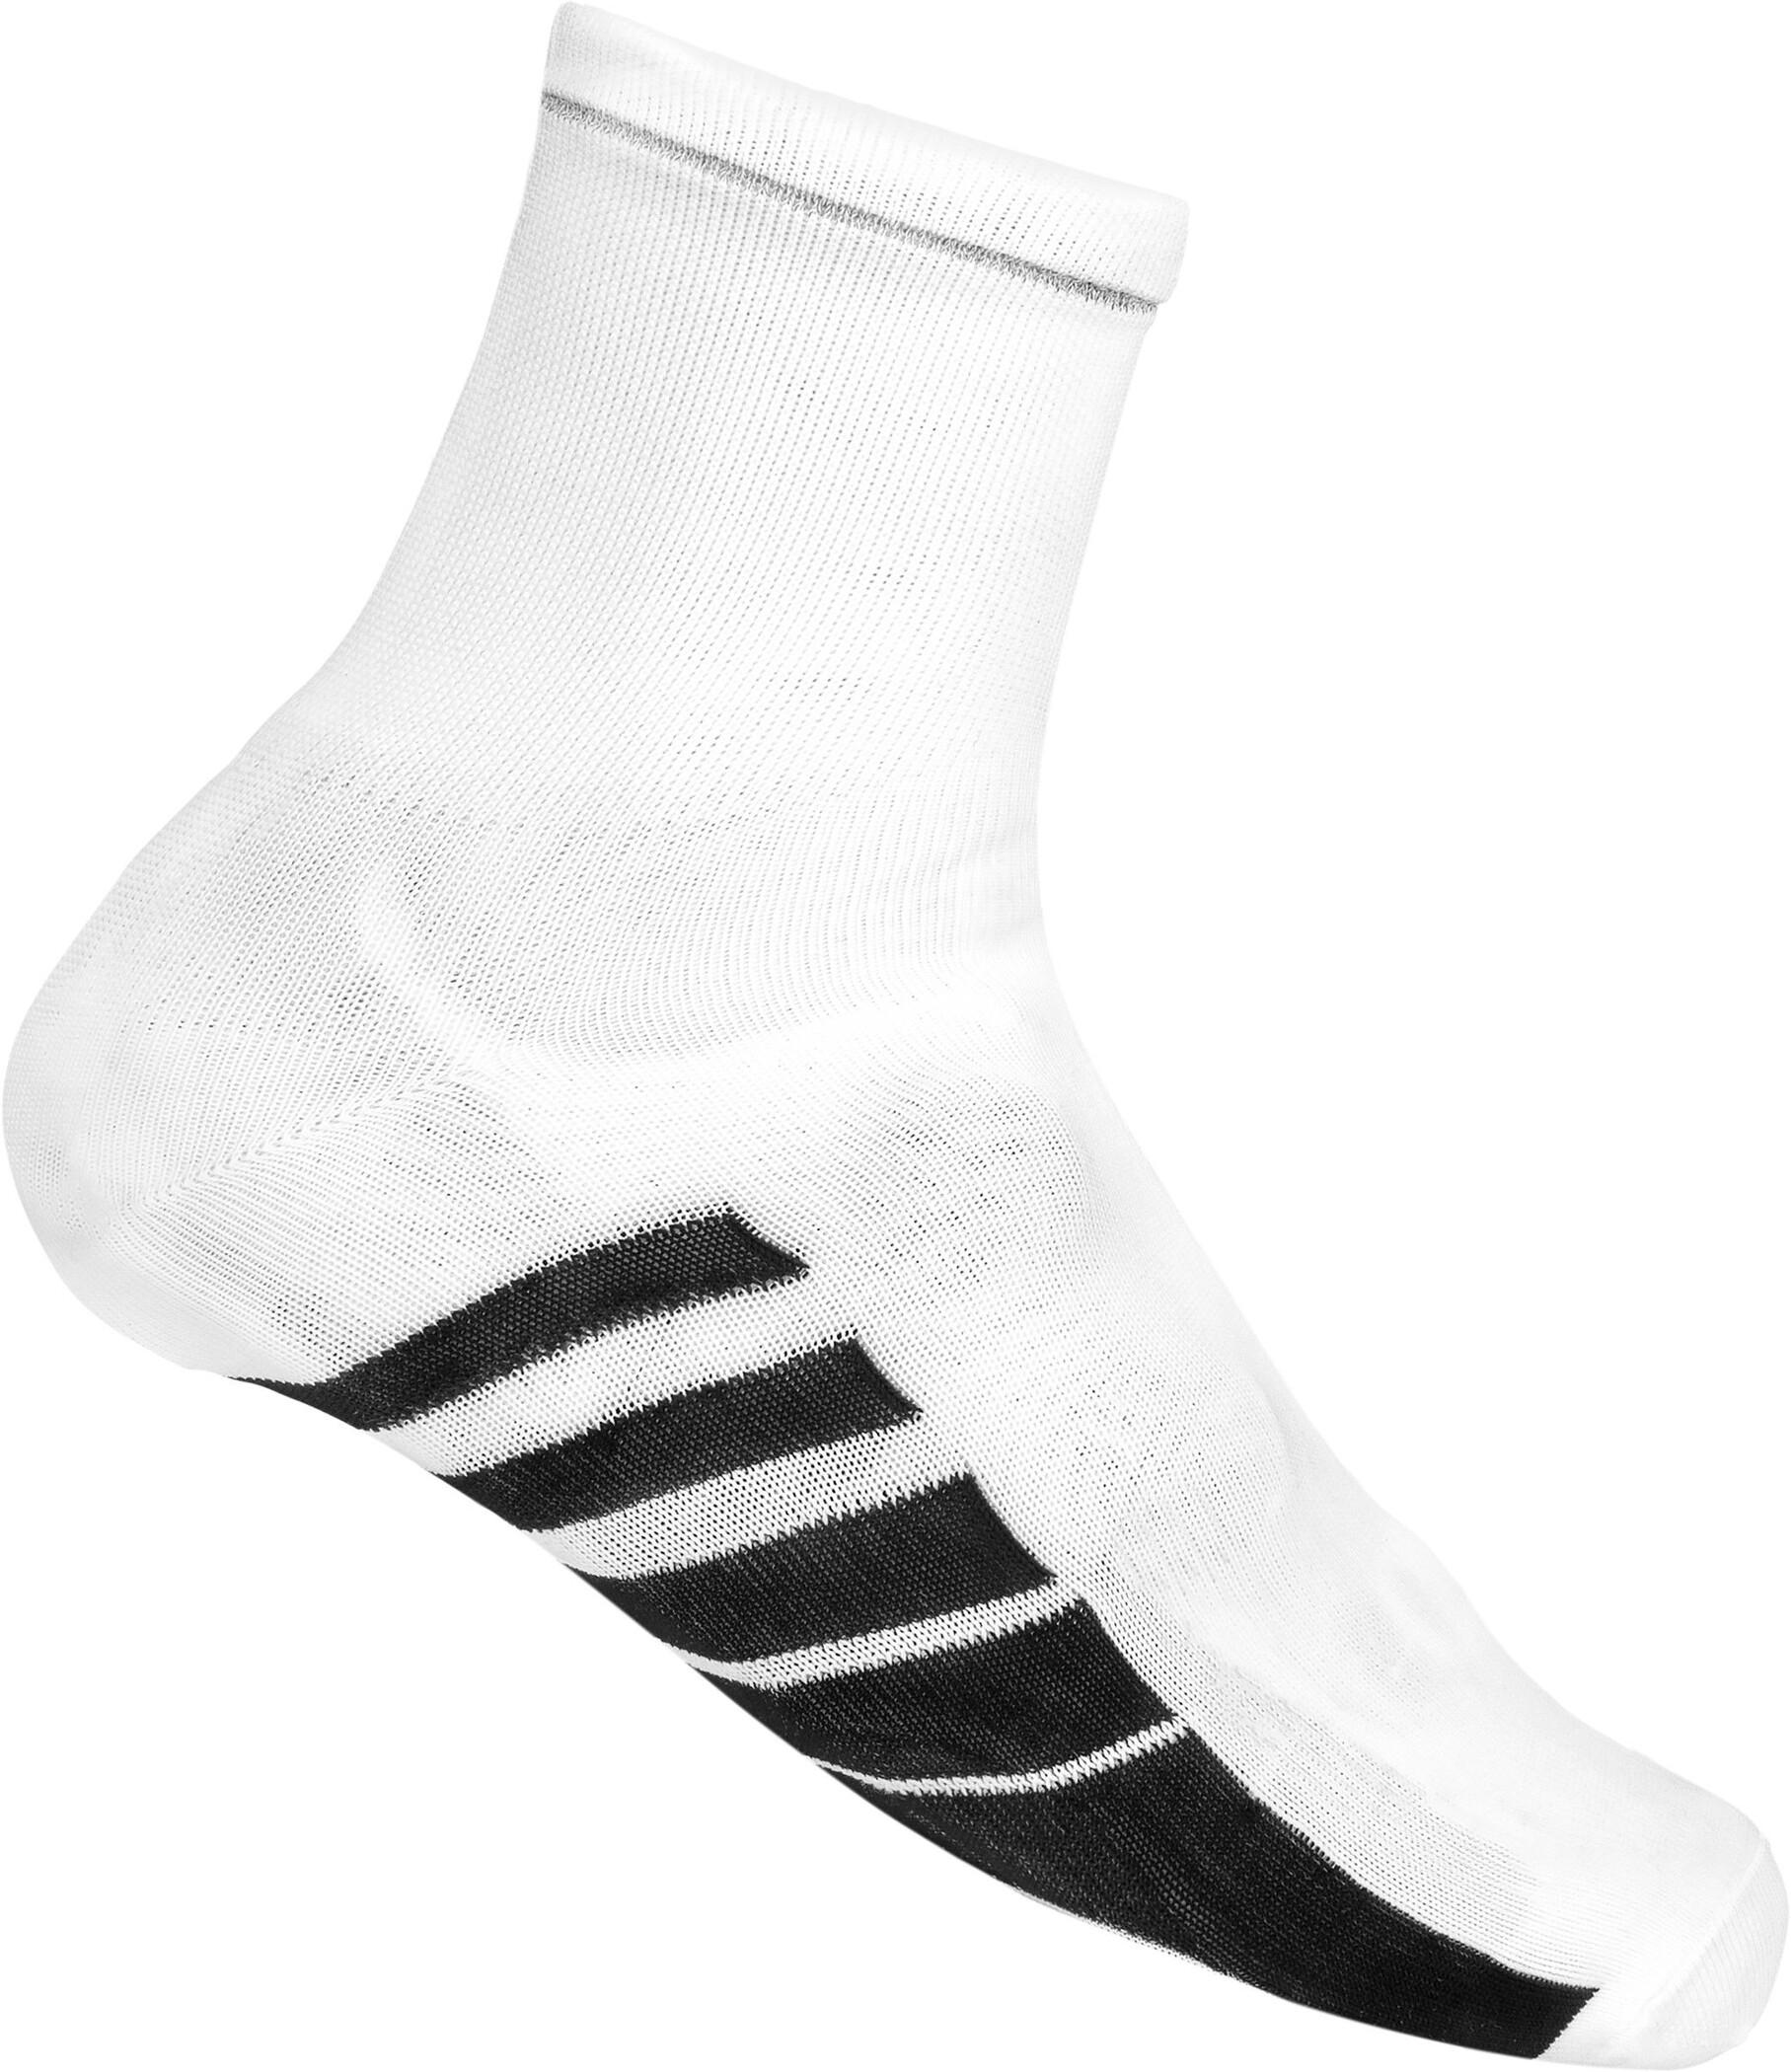 GripGrab Primavera Skoovertræk, white (2019) | shoecovers_clothes